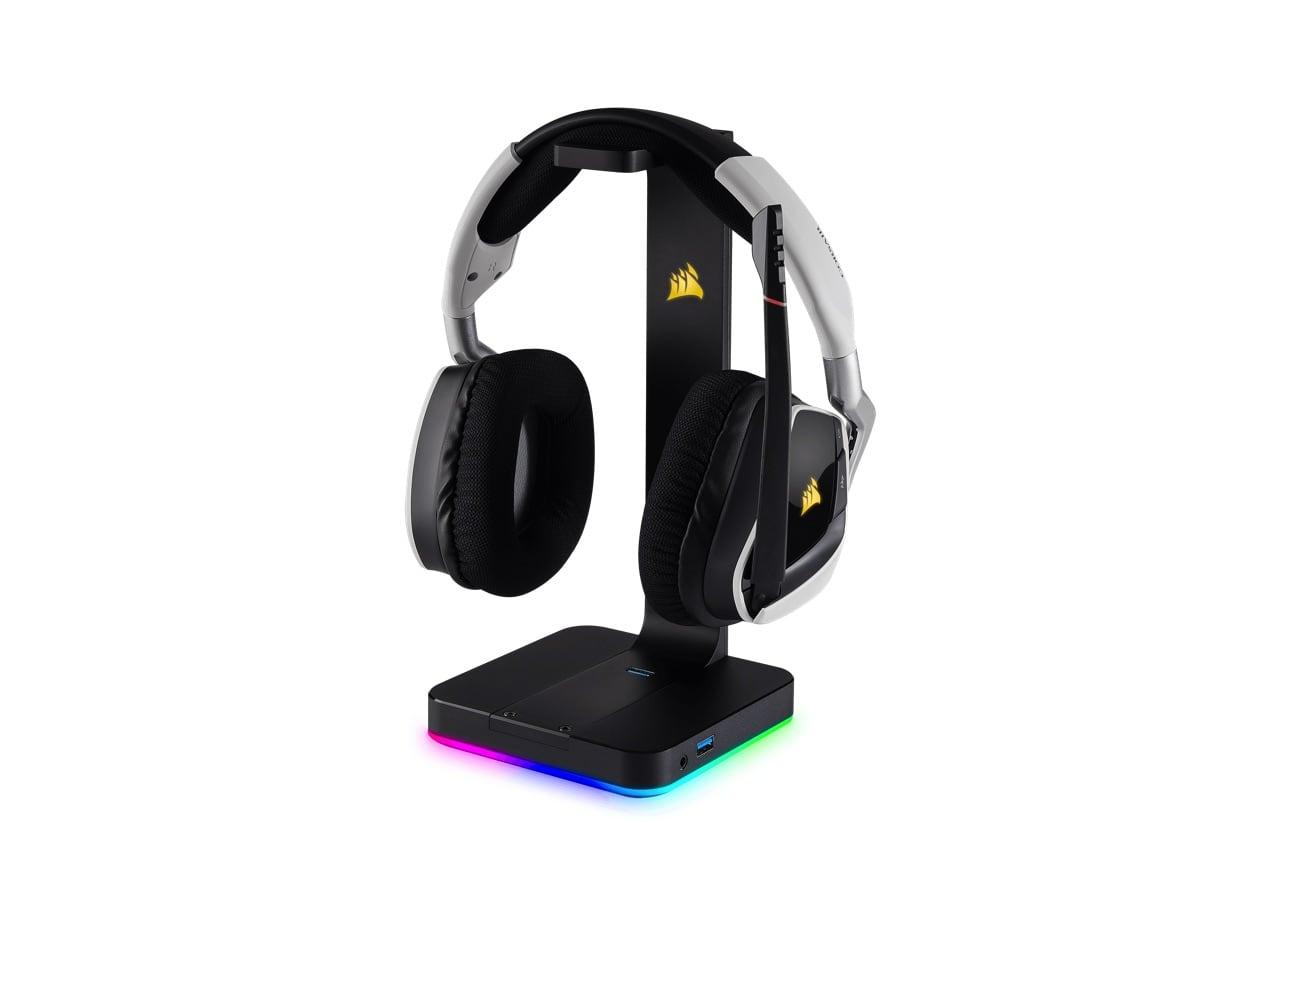 CORSAIR ST100 RGB Premium Gaming Headset Stand